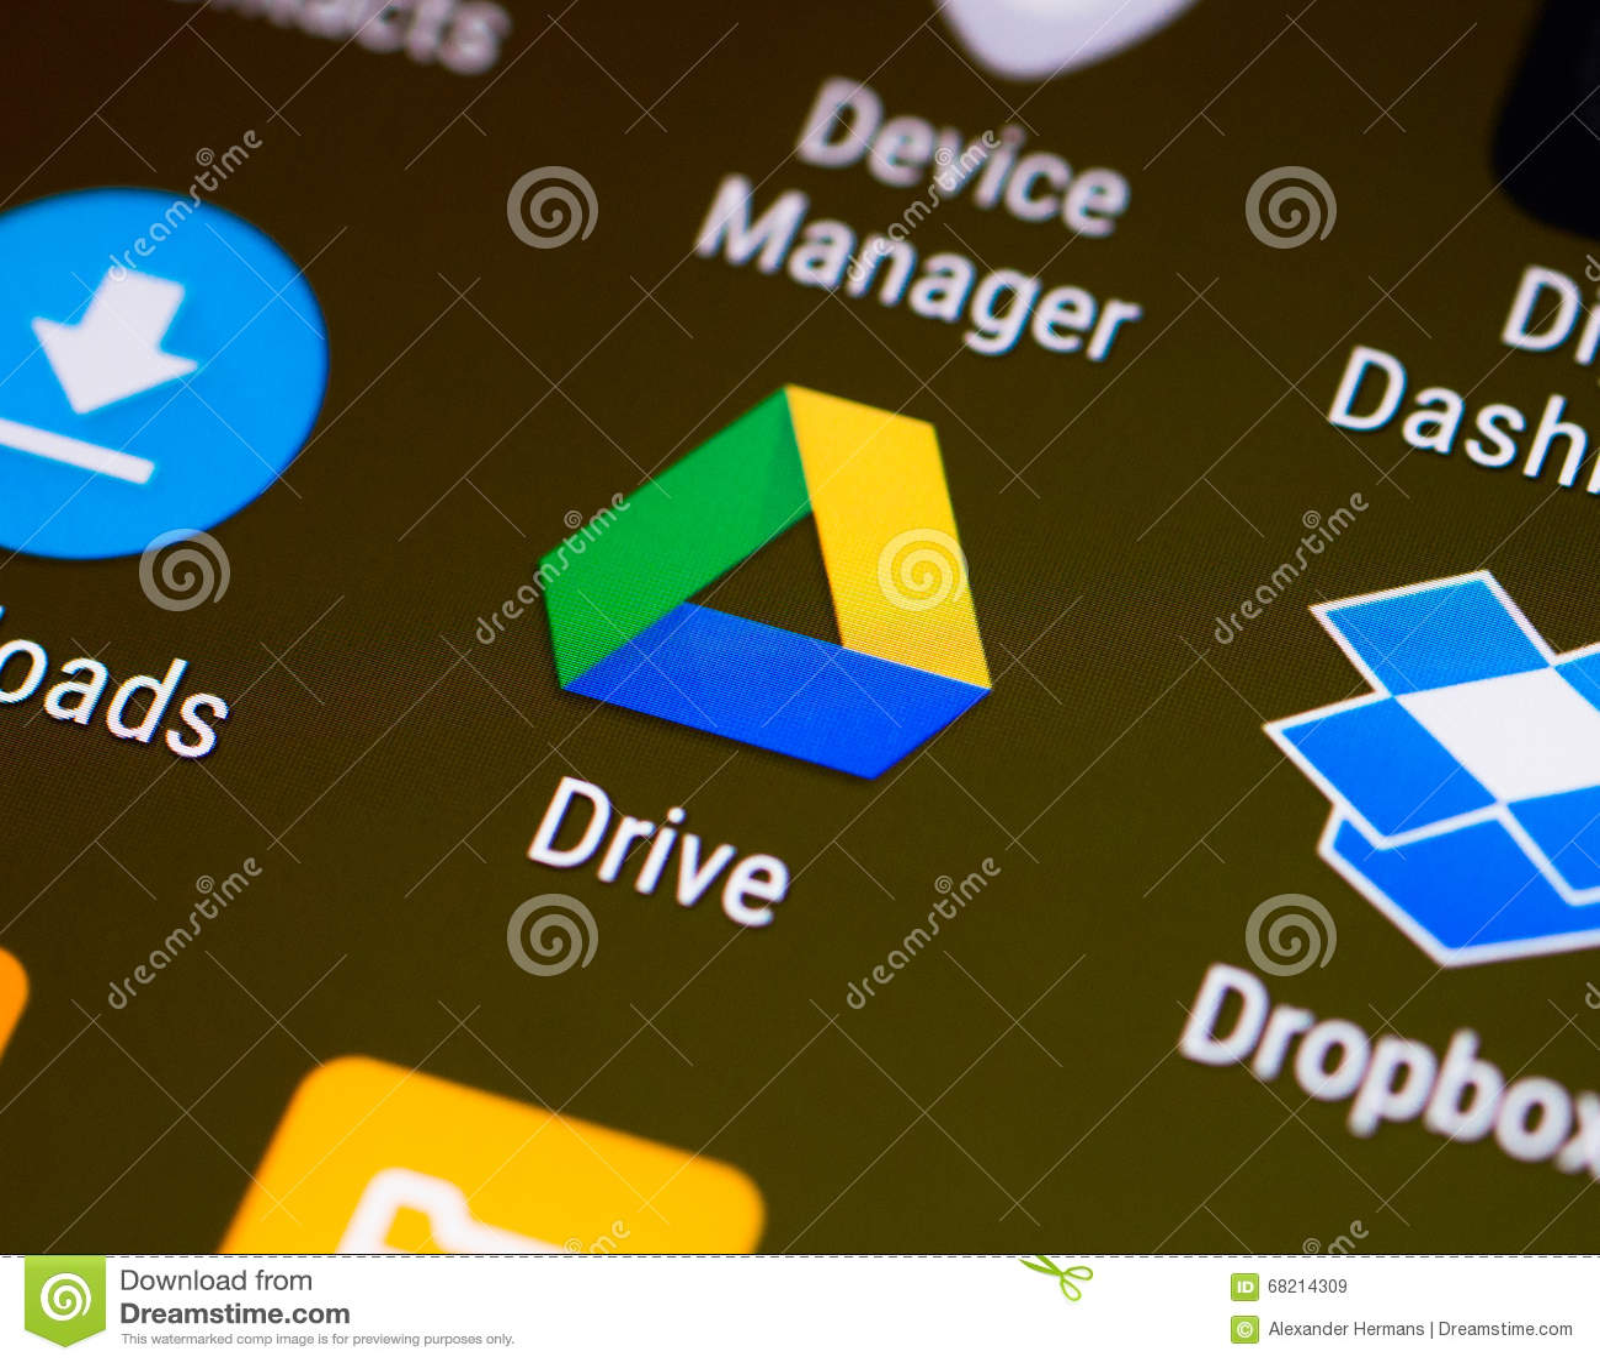 Google Drive Application Thumbnail / Logo On An Android